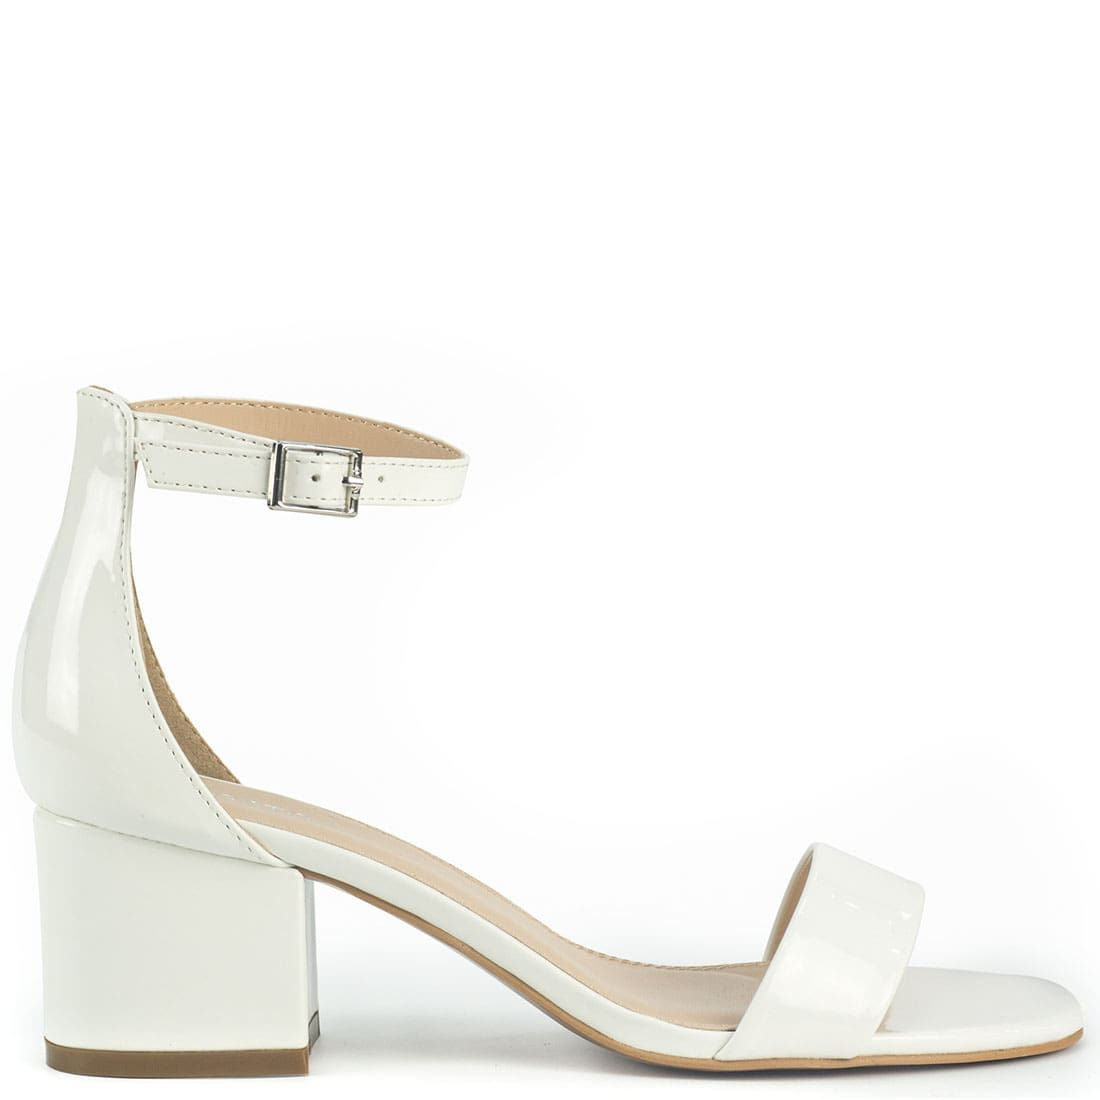 White sandal in patent ST0569-L13